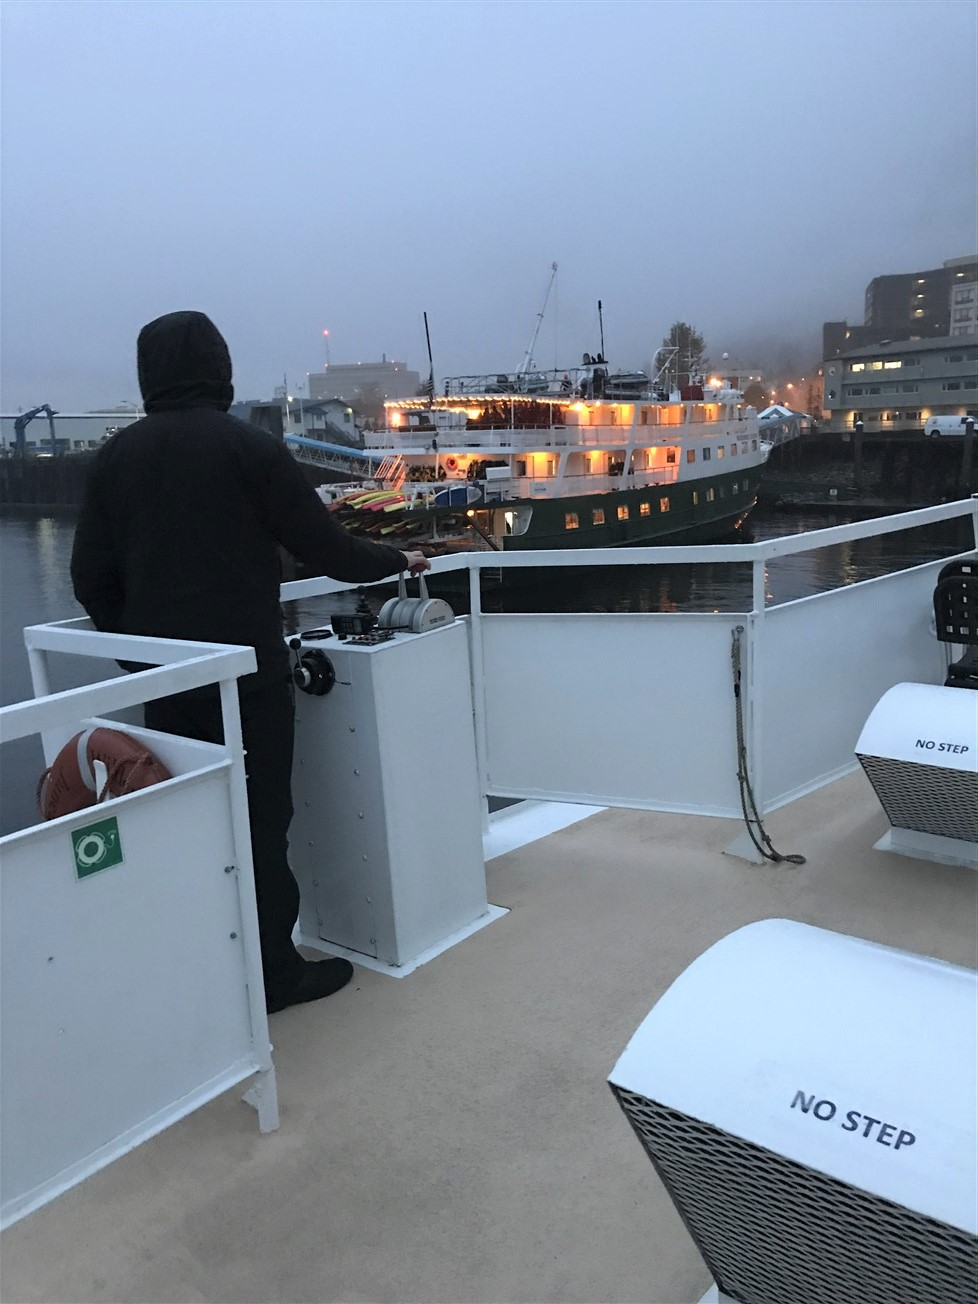 2017 09 23 2 Alaskan Cruise.jpg